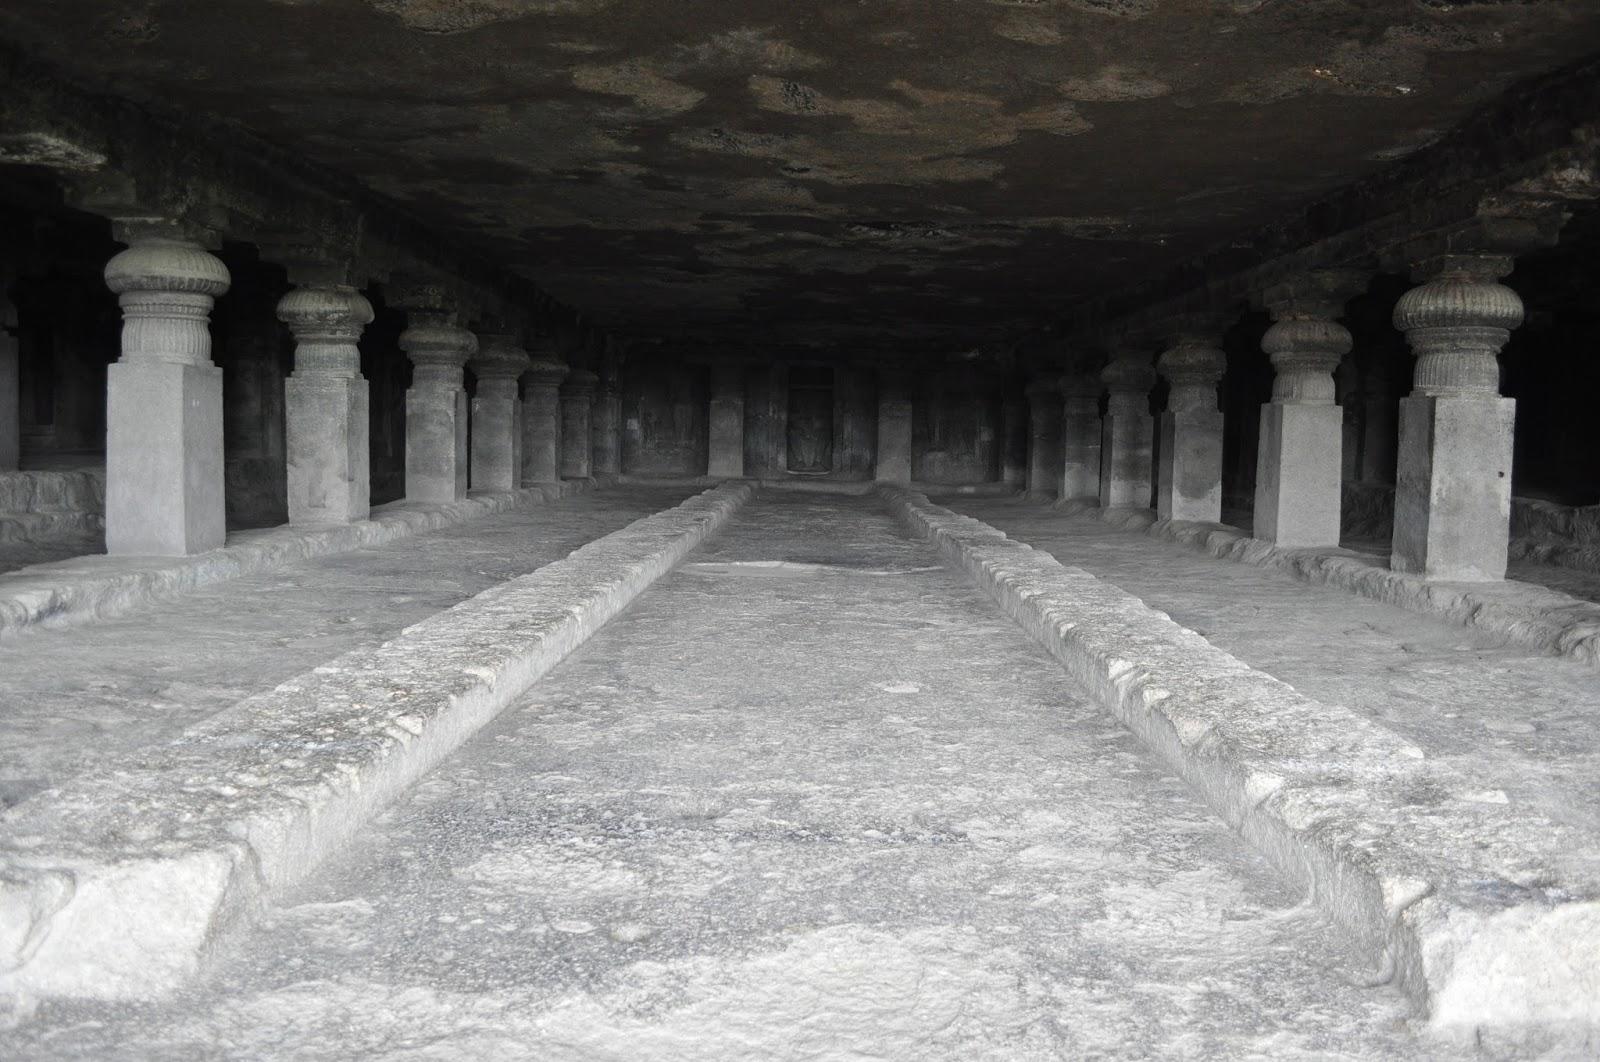 Road less travelled ellora caves aliens love affair